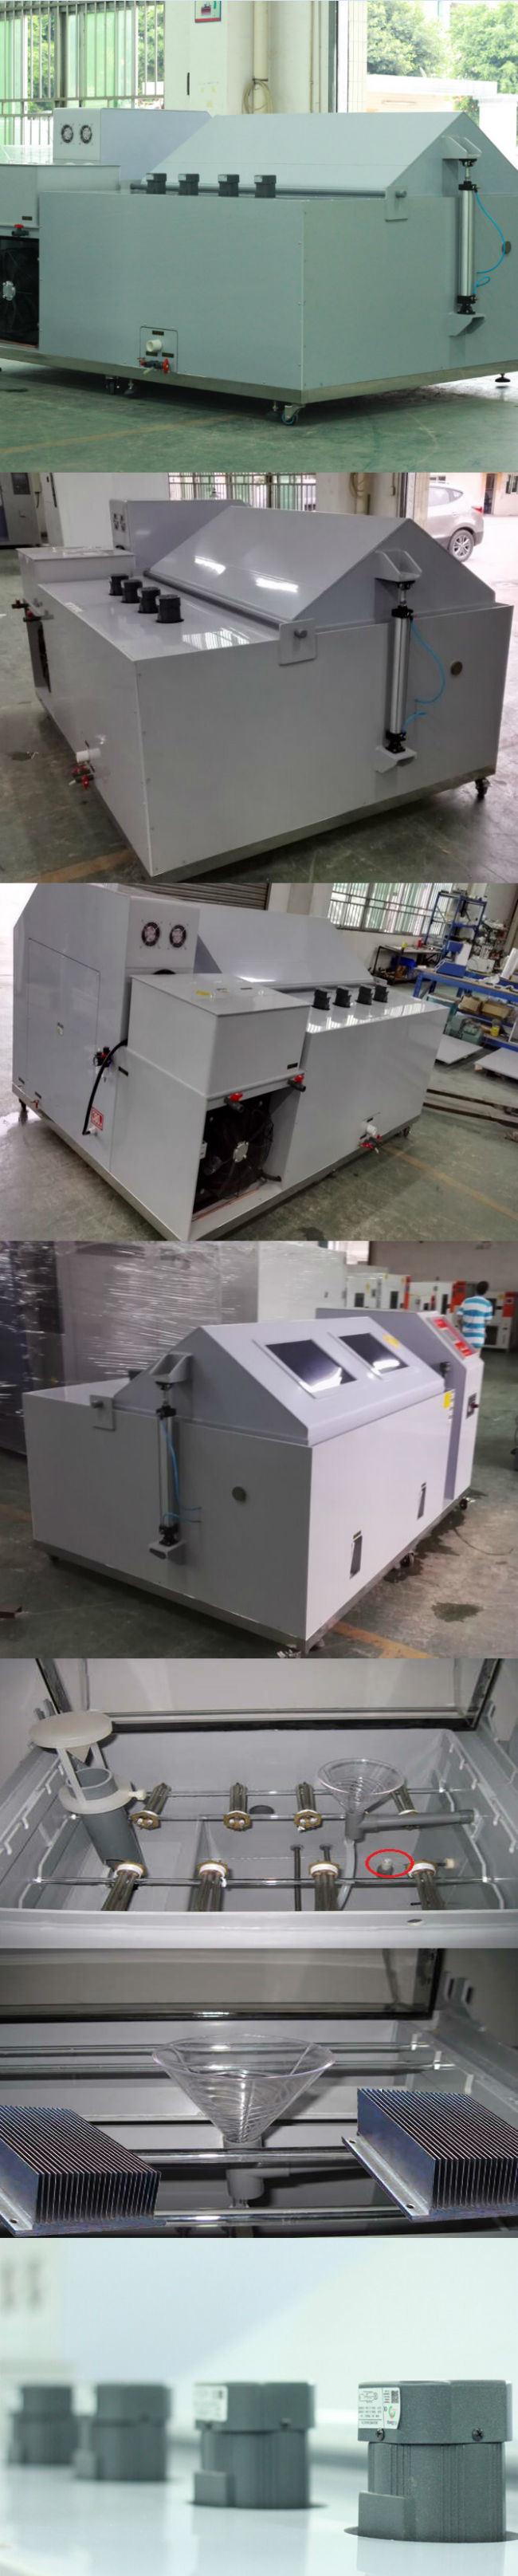 Astmb117 Temperature Humidity Compound Salt Spray Cyclic Corrosion Test Chamber